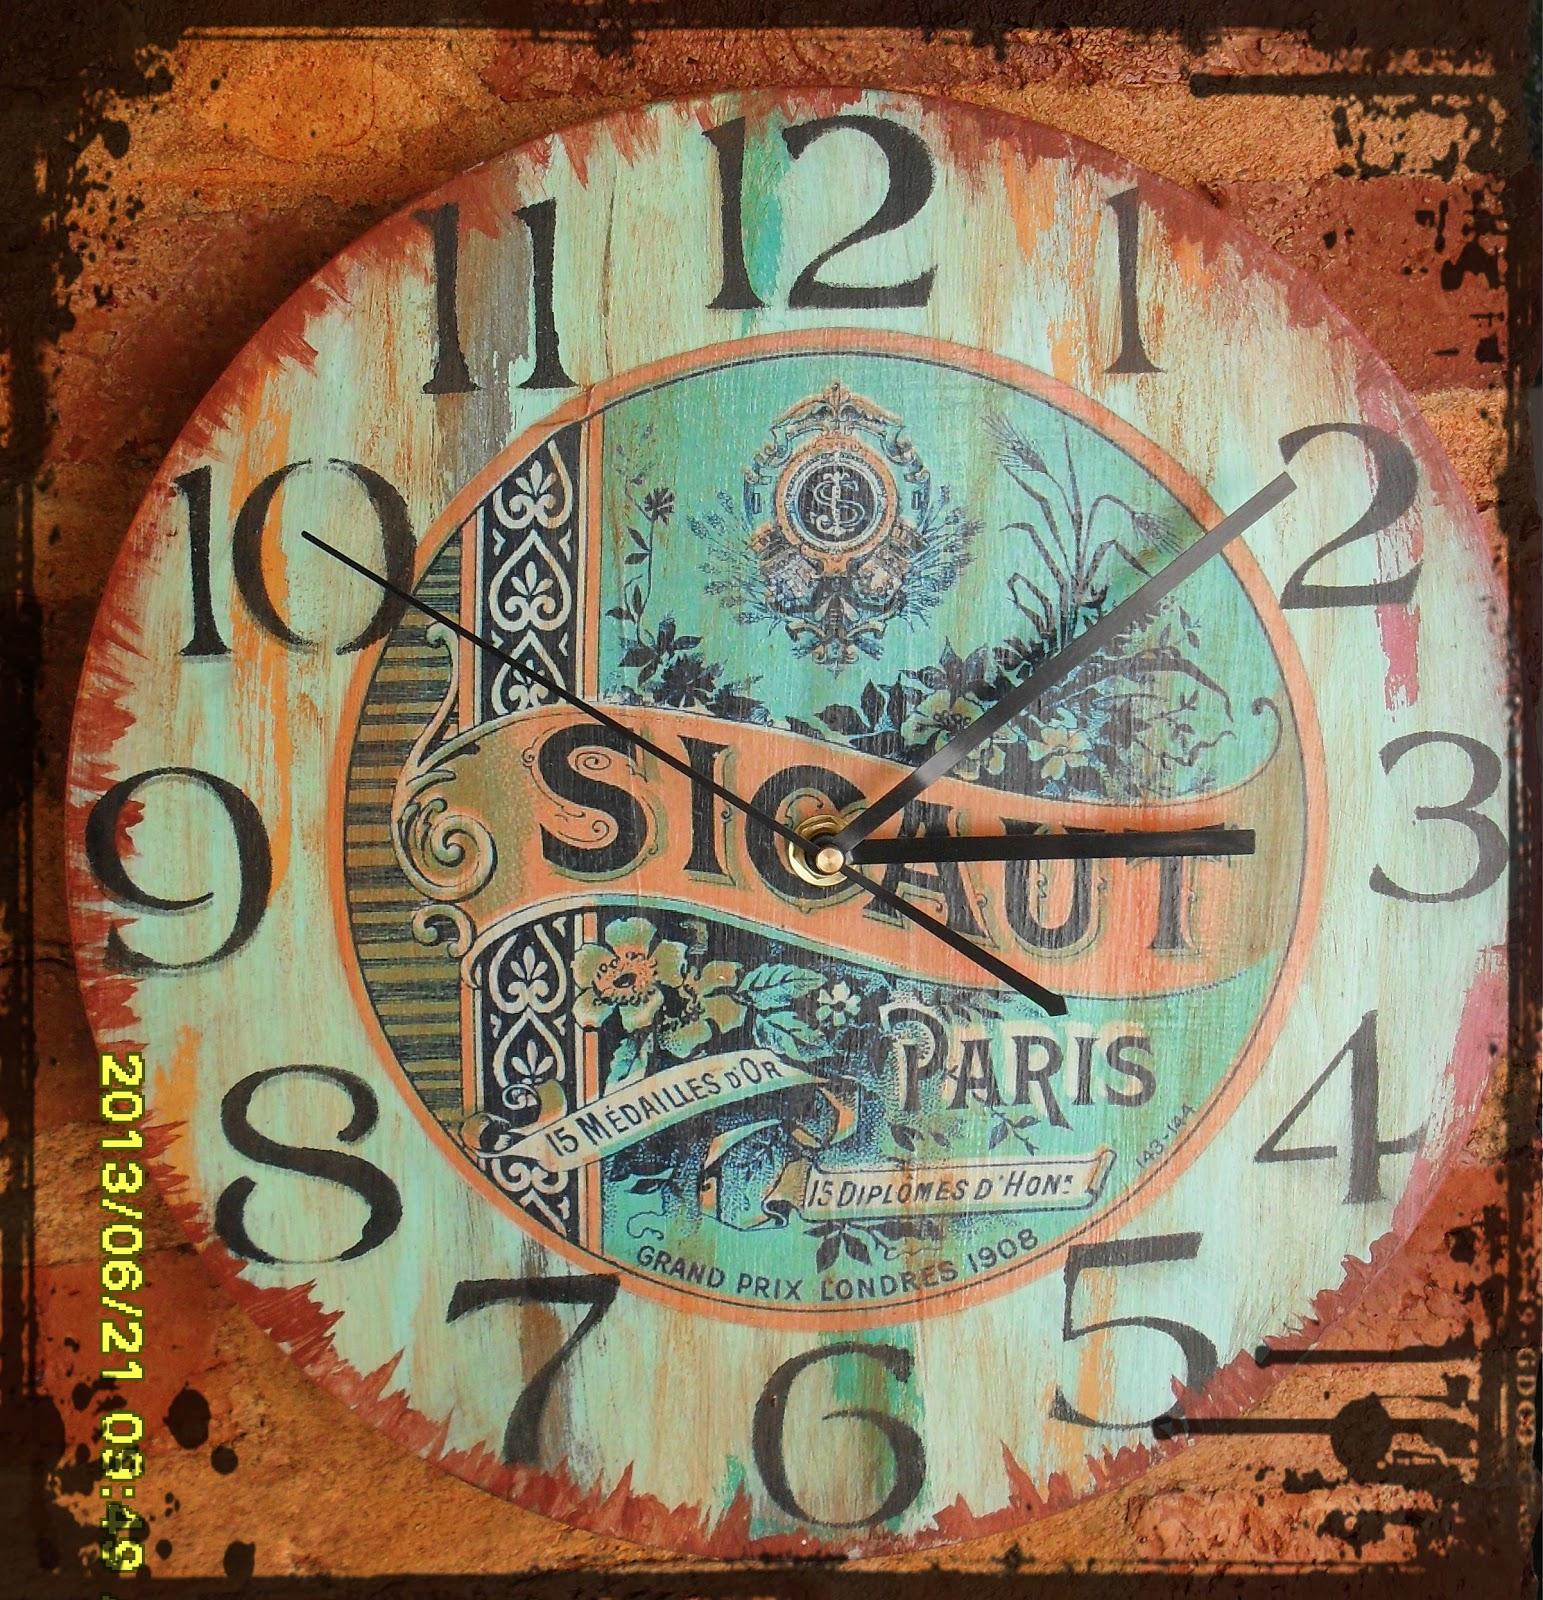 Libert deco vintage reloj estilo industrial for Reloj pared estilo industrial